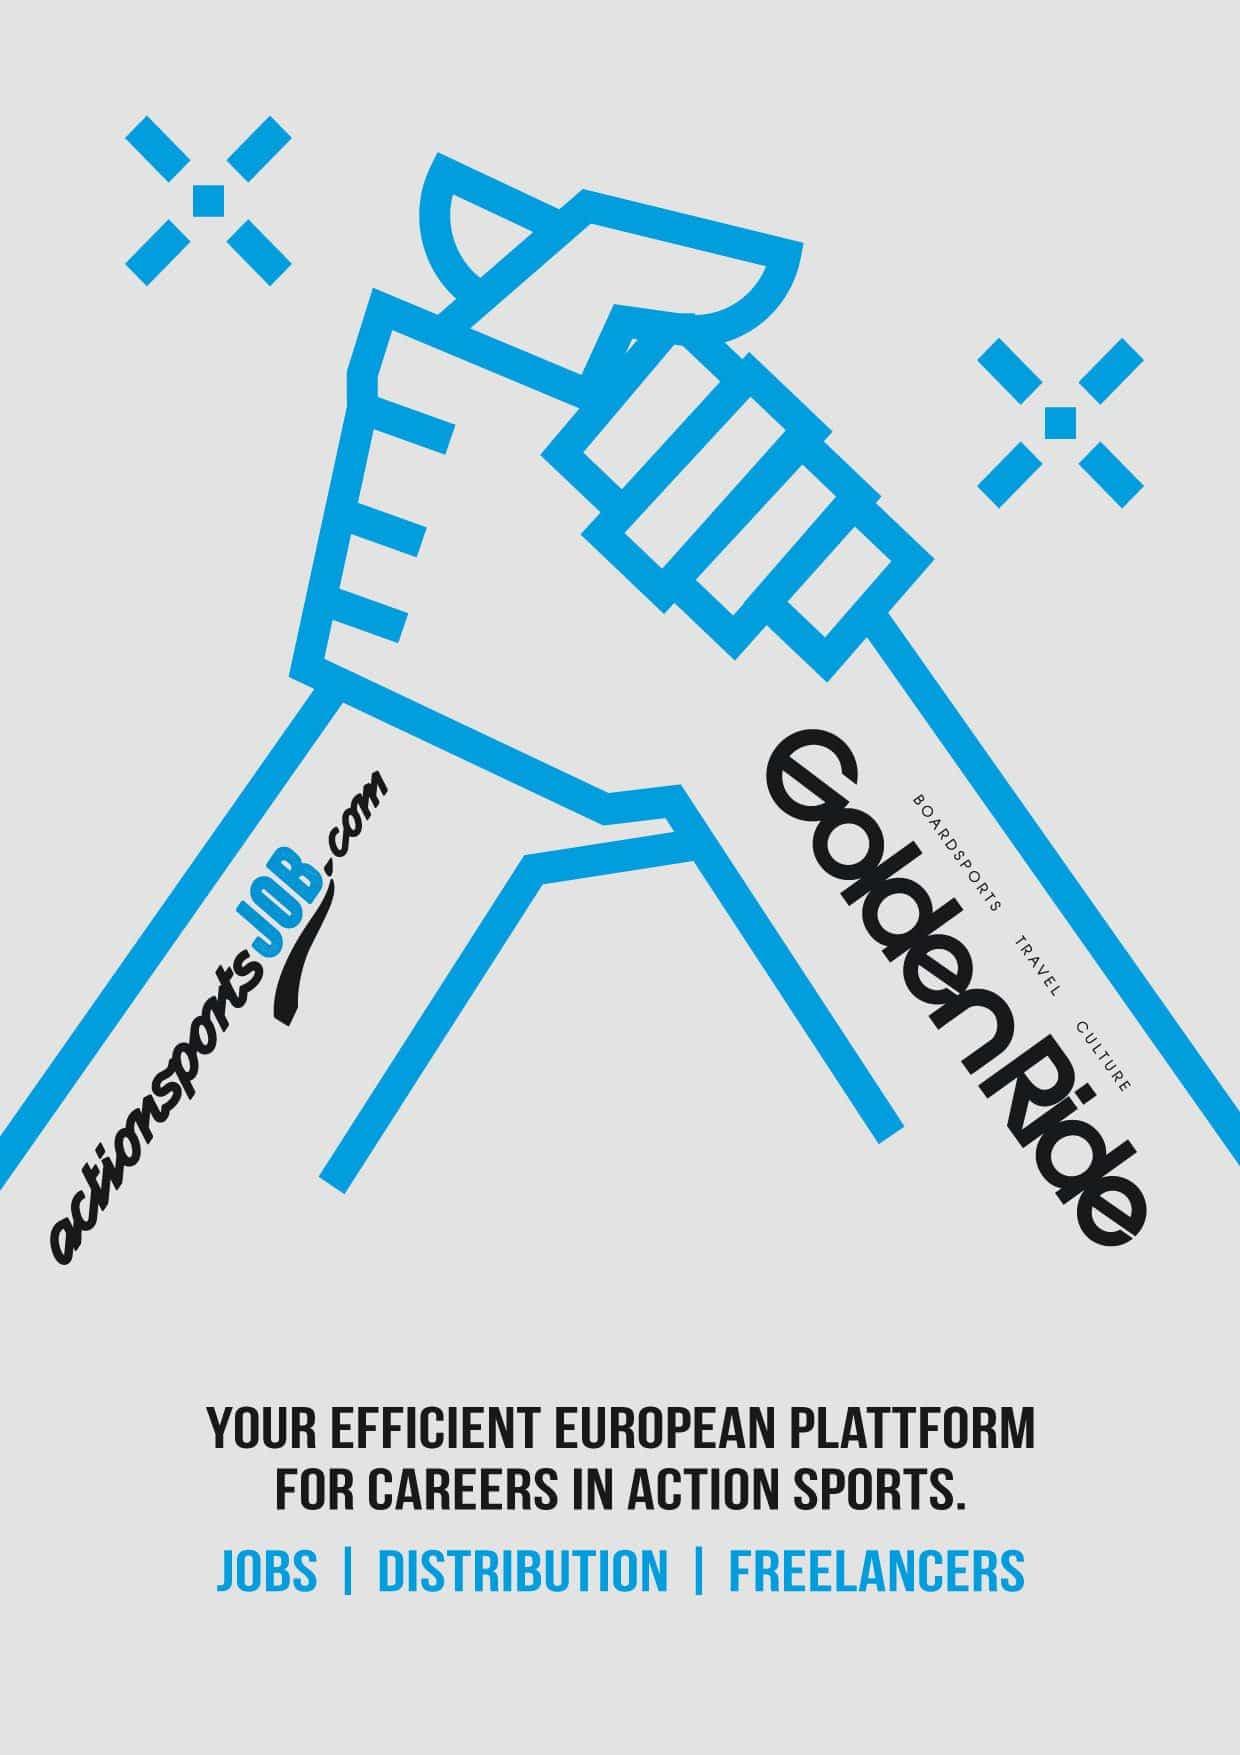 actionsportsJOB.com & Golden Ride Kooperation